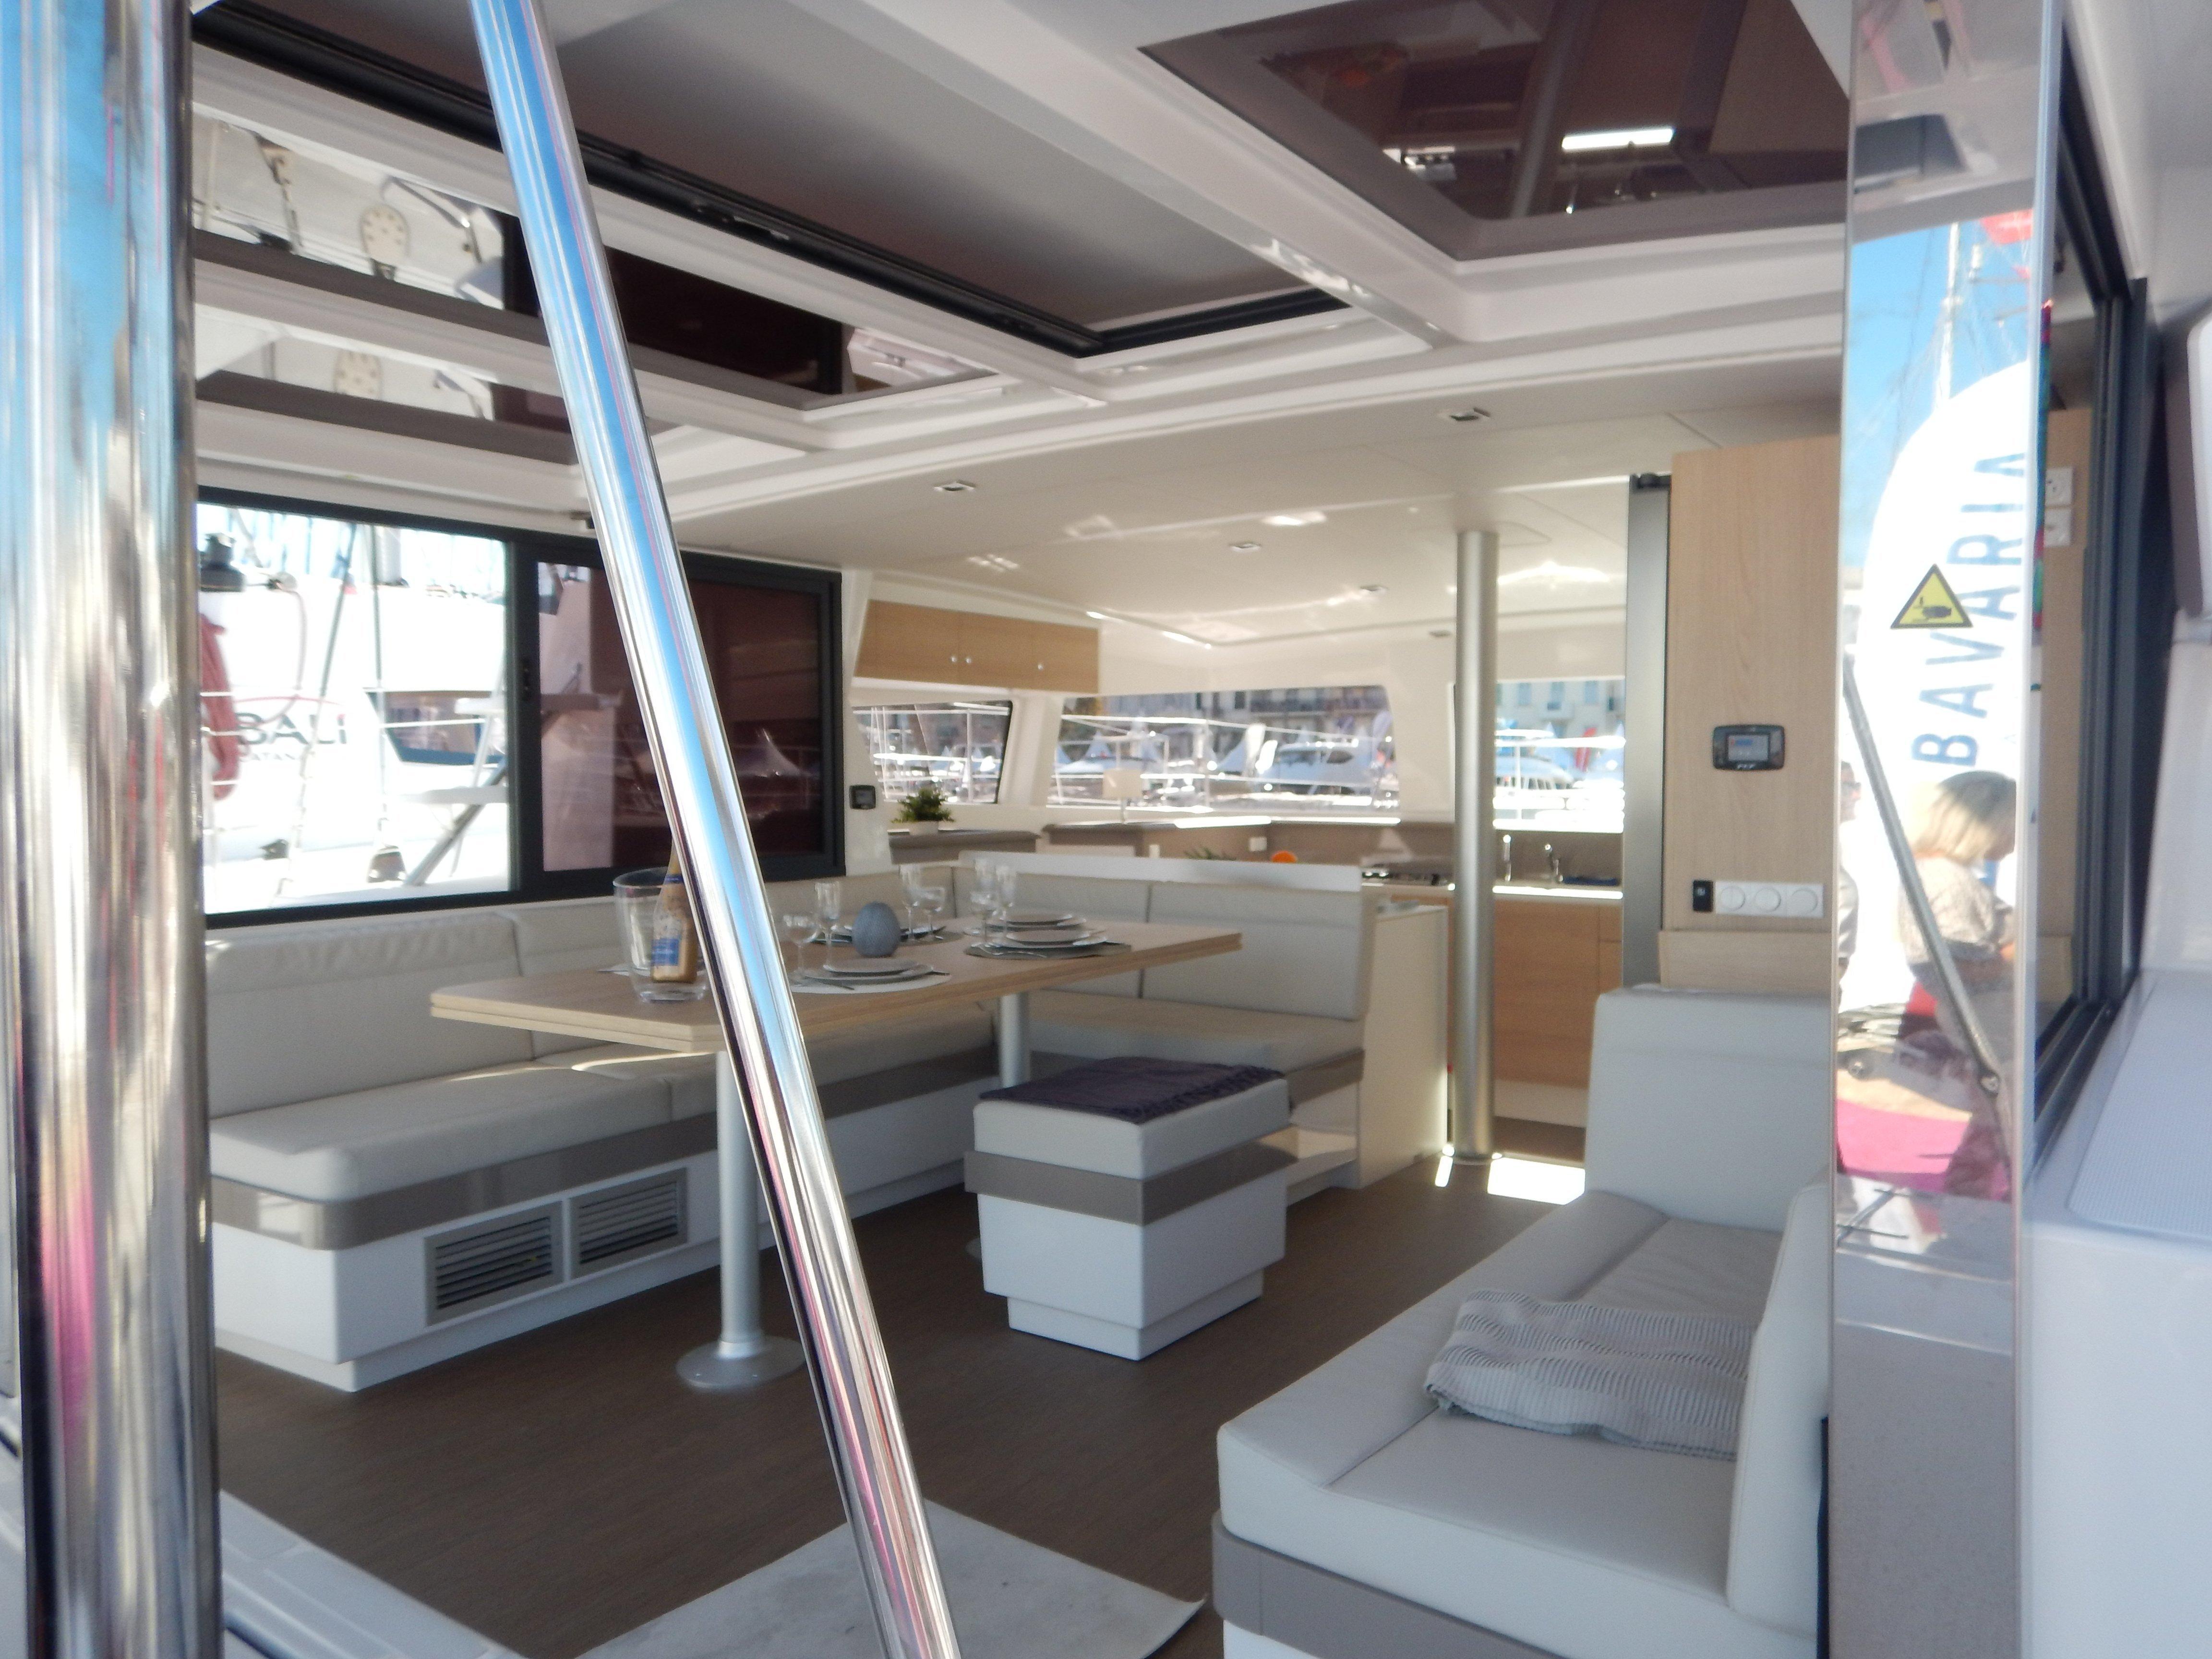 Bali 4.3 - 4 double cabins (Carpe Ventum)  - 2